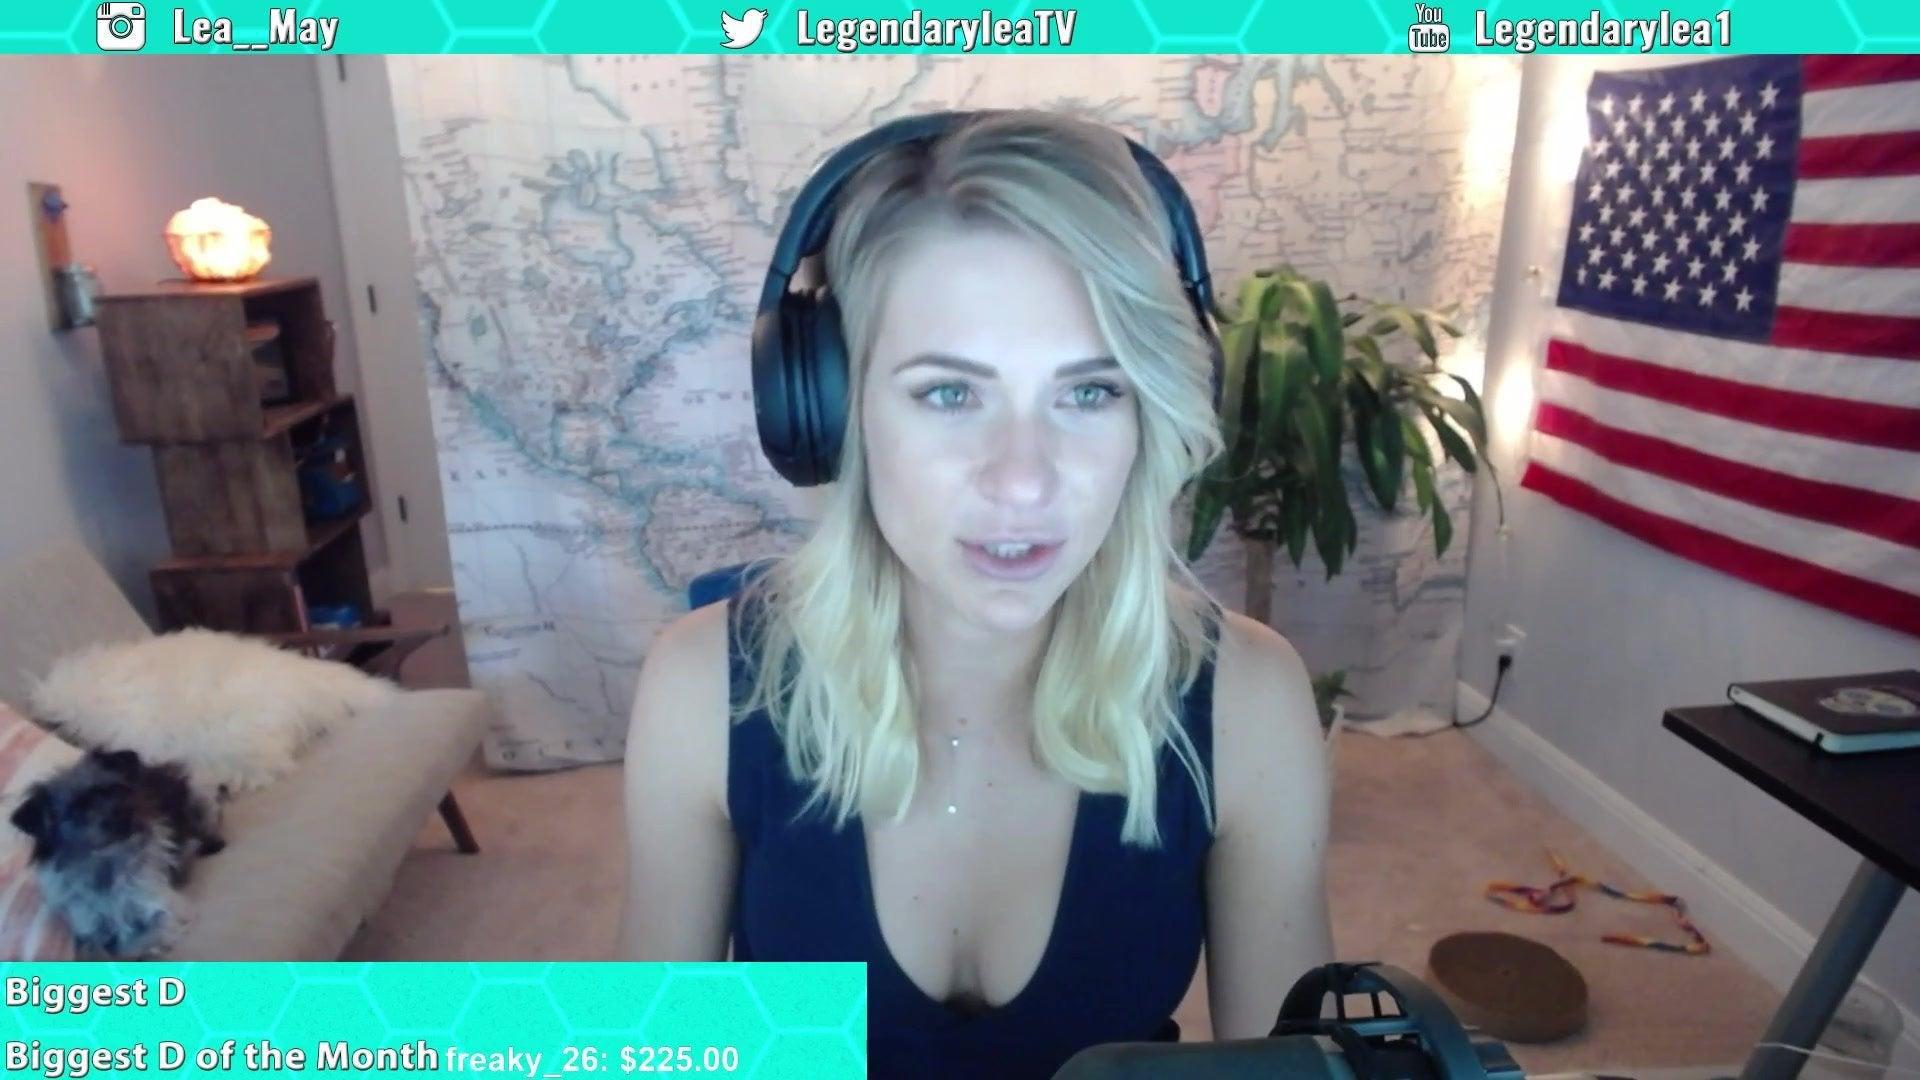 Legendary Lea Twitch